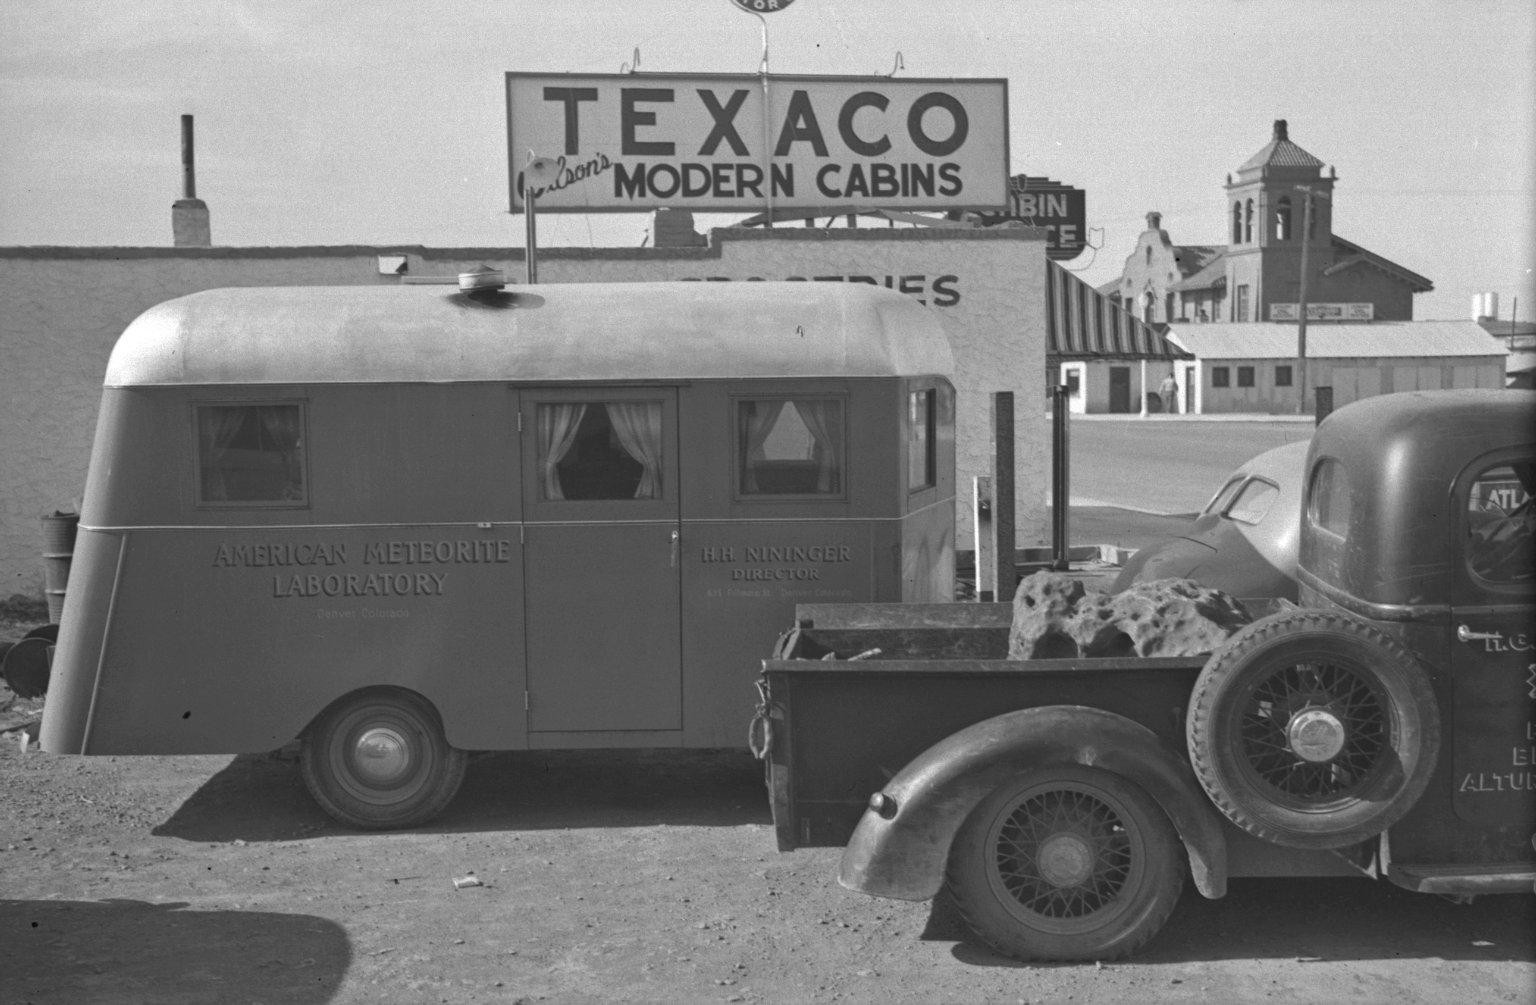 American Meteorite Labratory trailer and pickup holding specimen